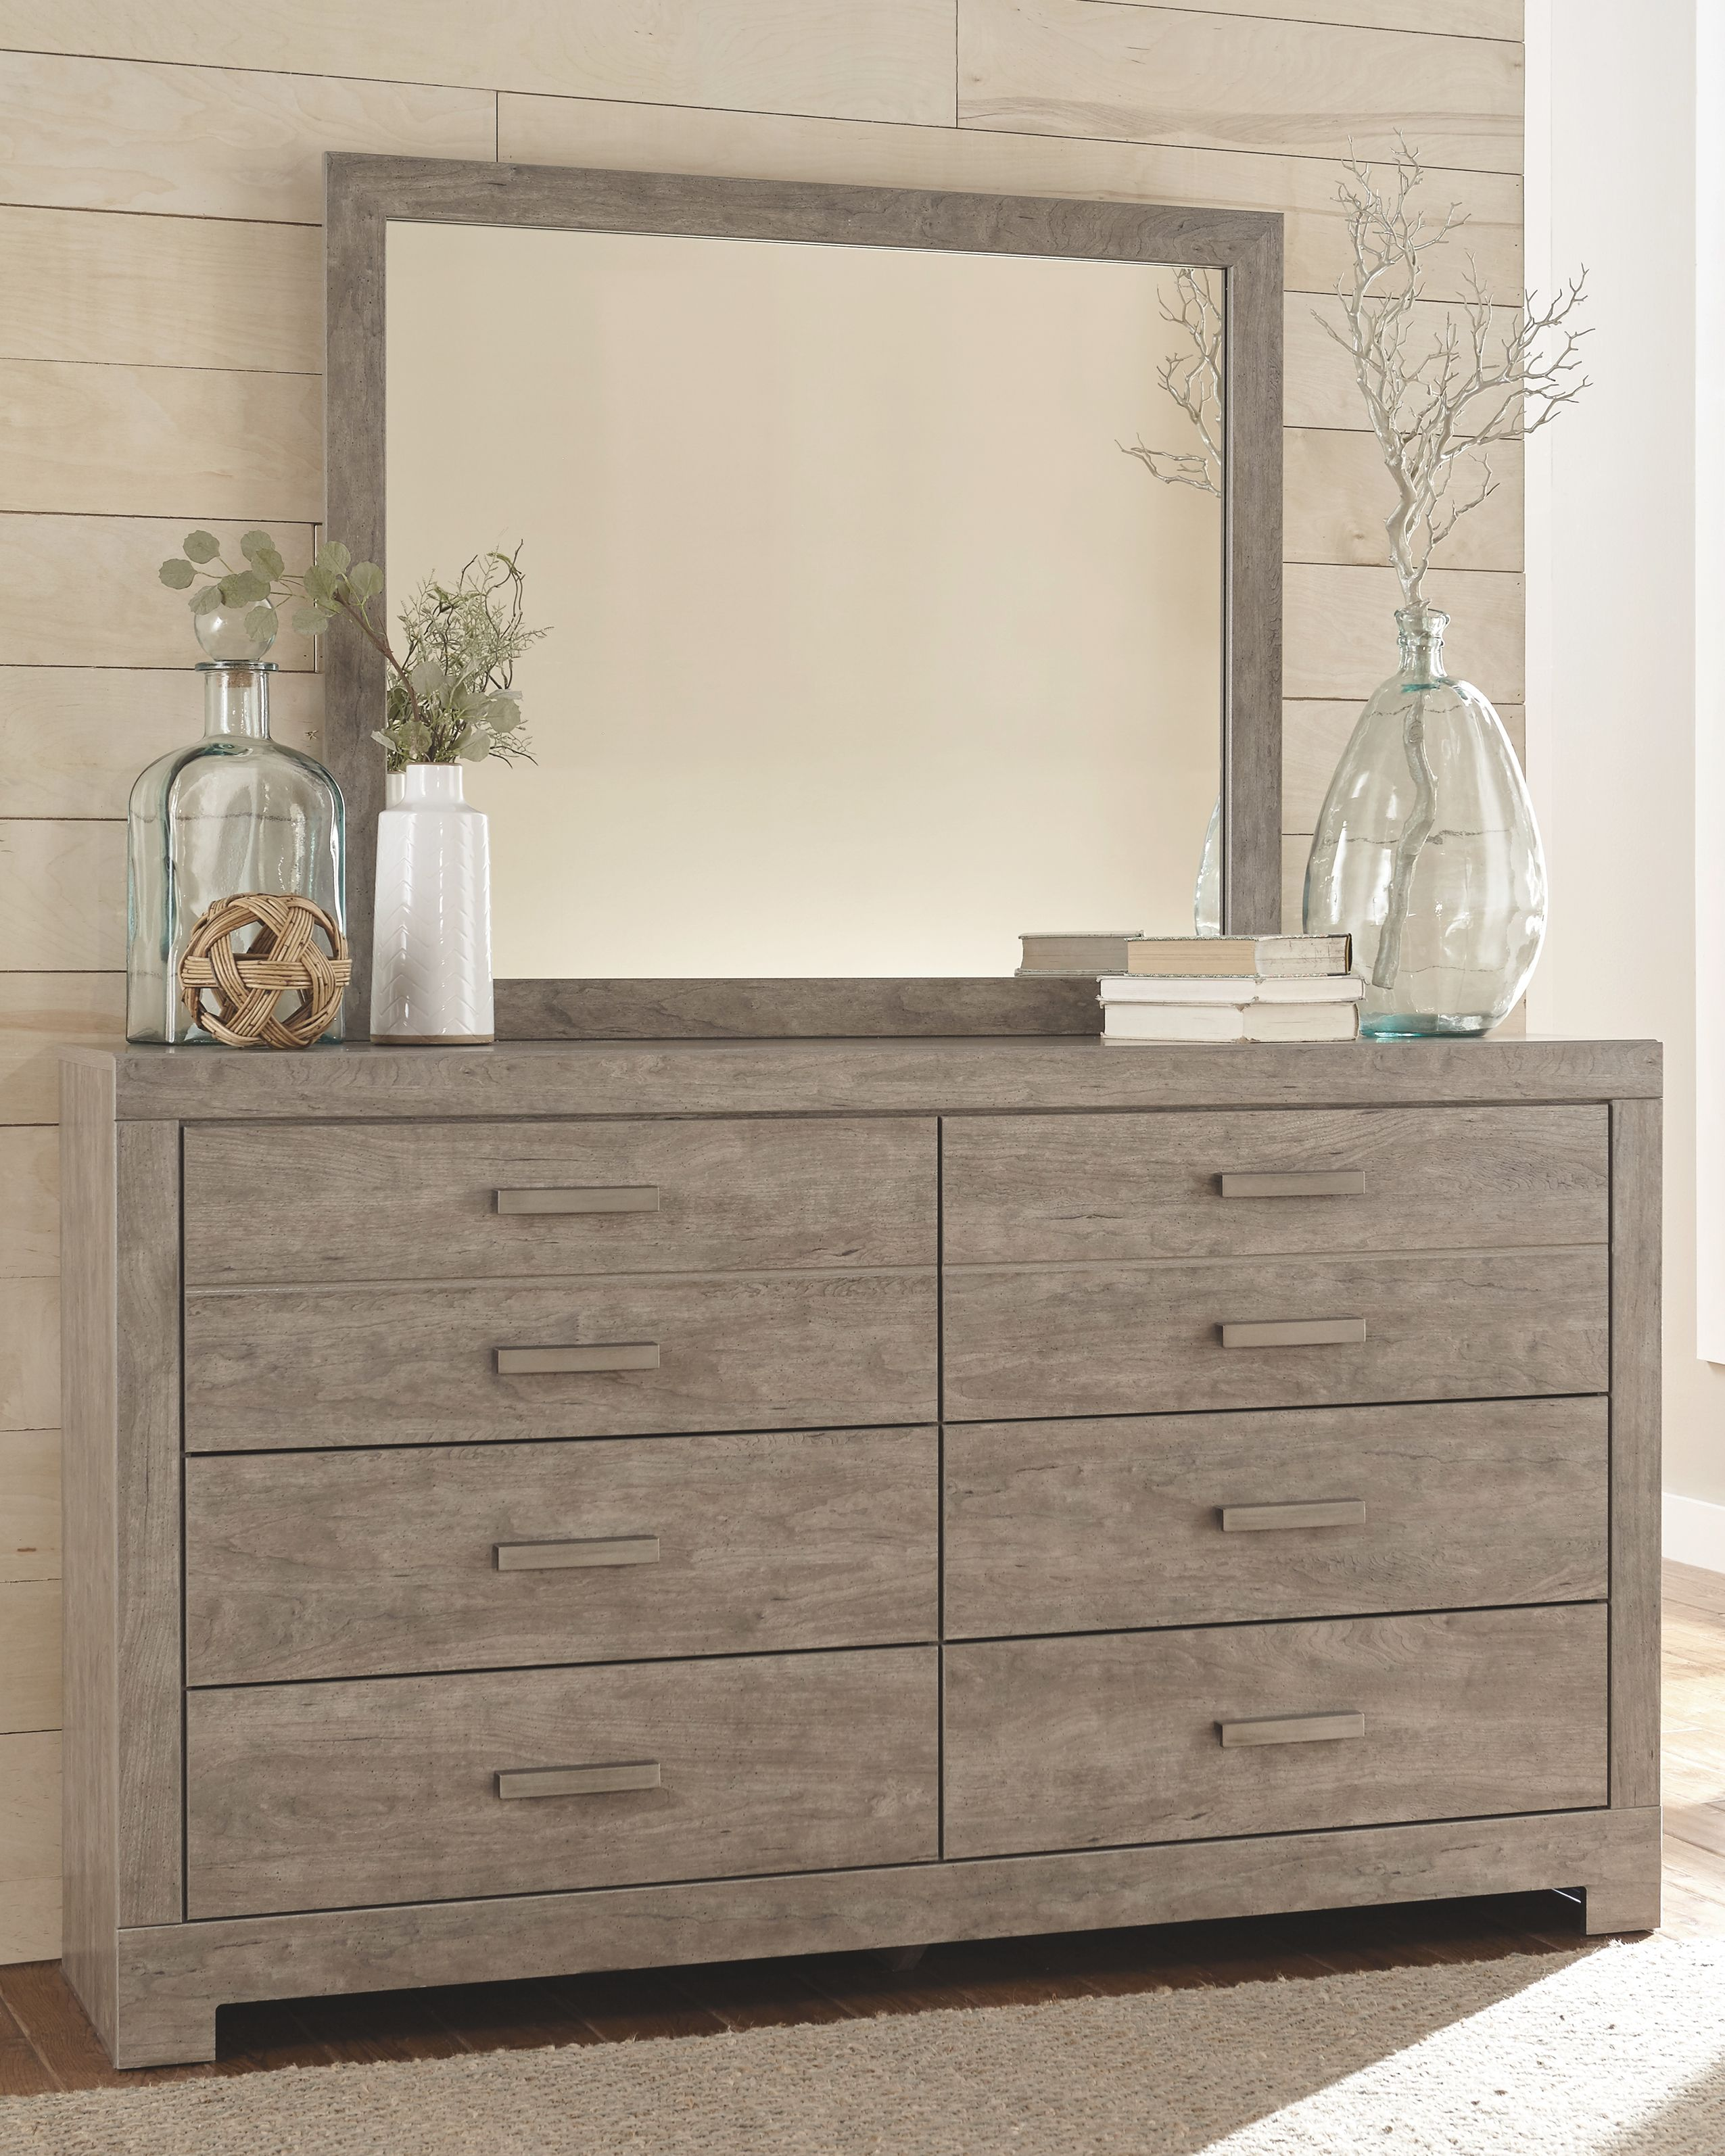 Culverbach Dresser and Mirror, Gray Ashley furniture